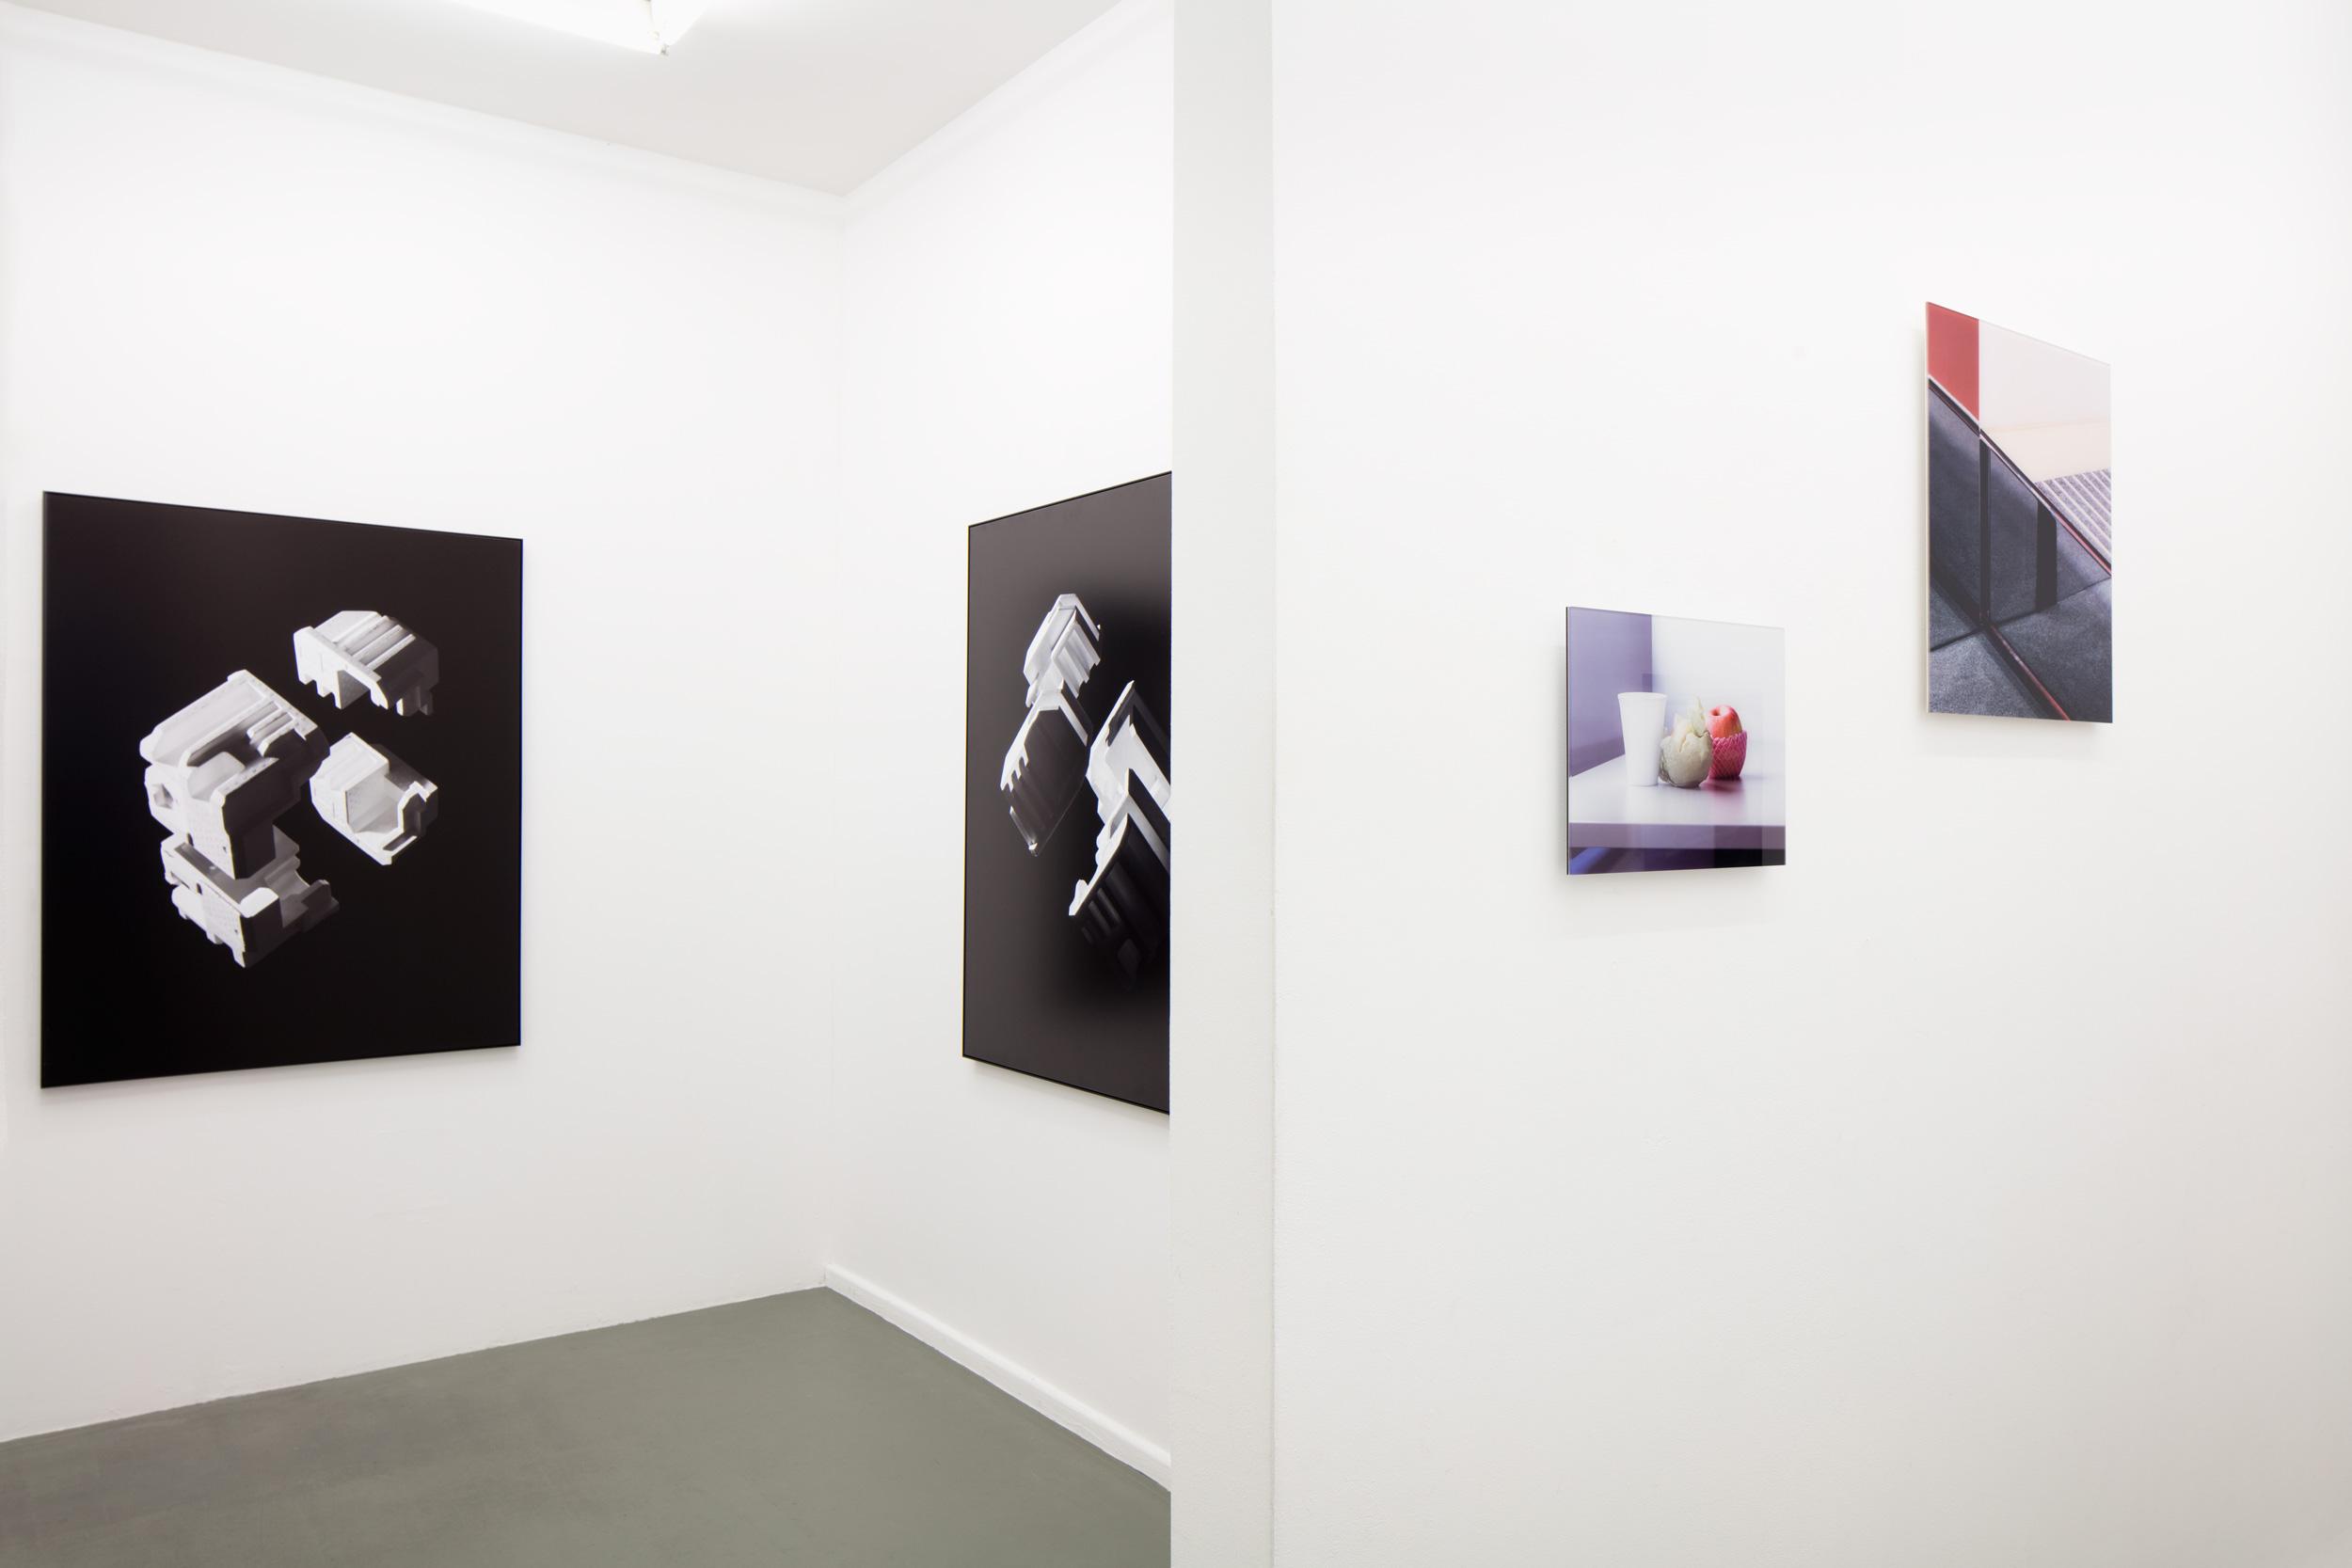 Ausstellungsansicht EDGES / still under construction, Rasche Ripken, 2018